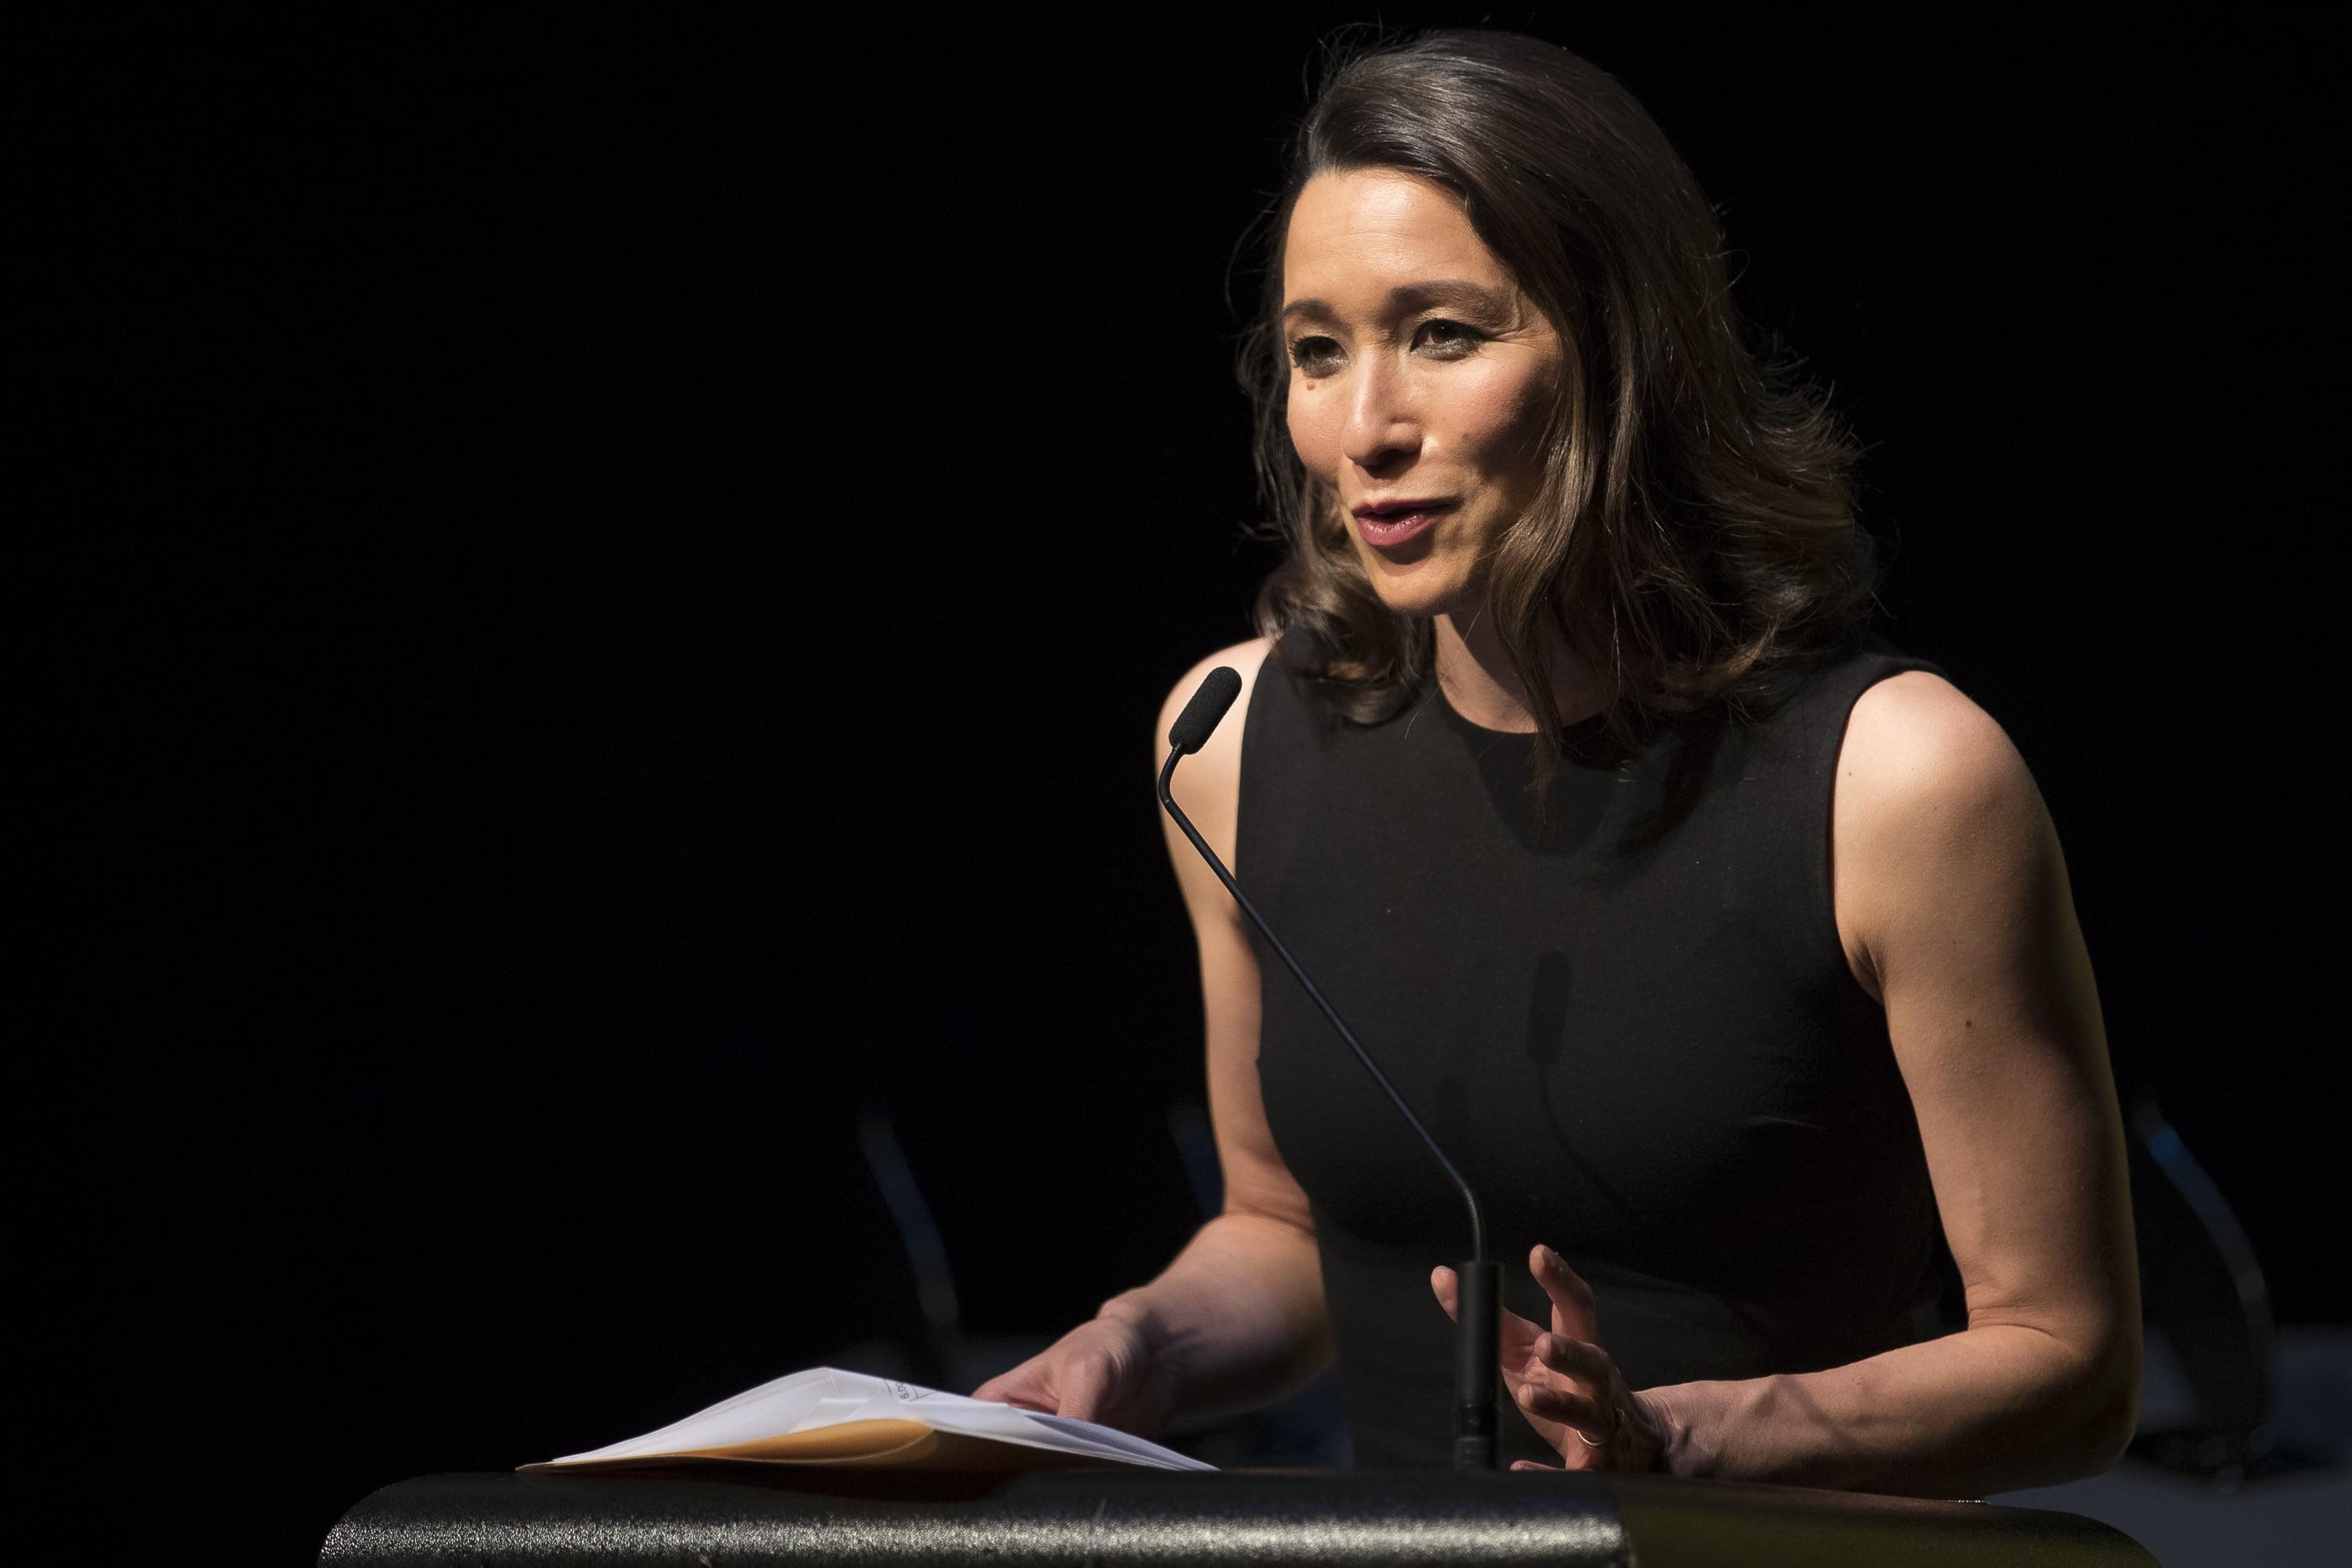 Kumi Taguchi, host of the 2017 Amnesty International Media Awards. © Joseph Mayers Photography